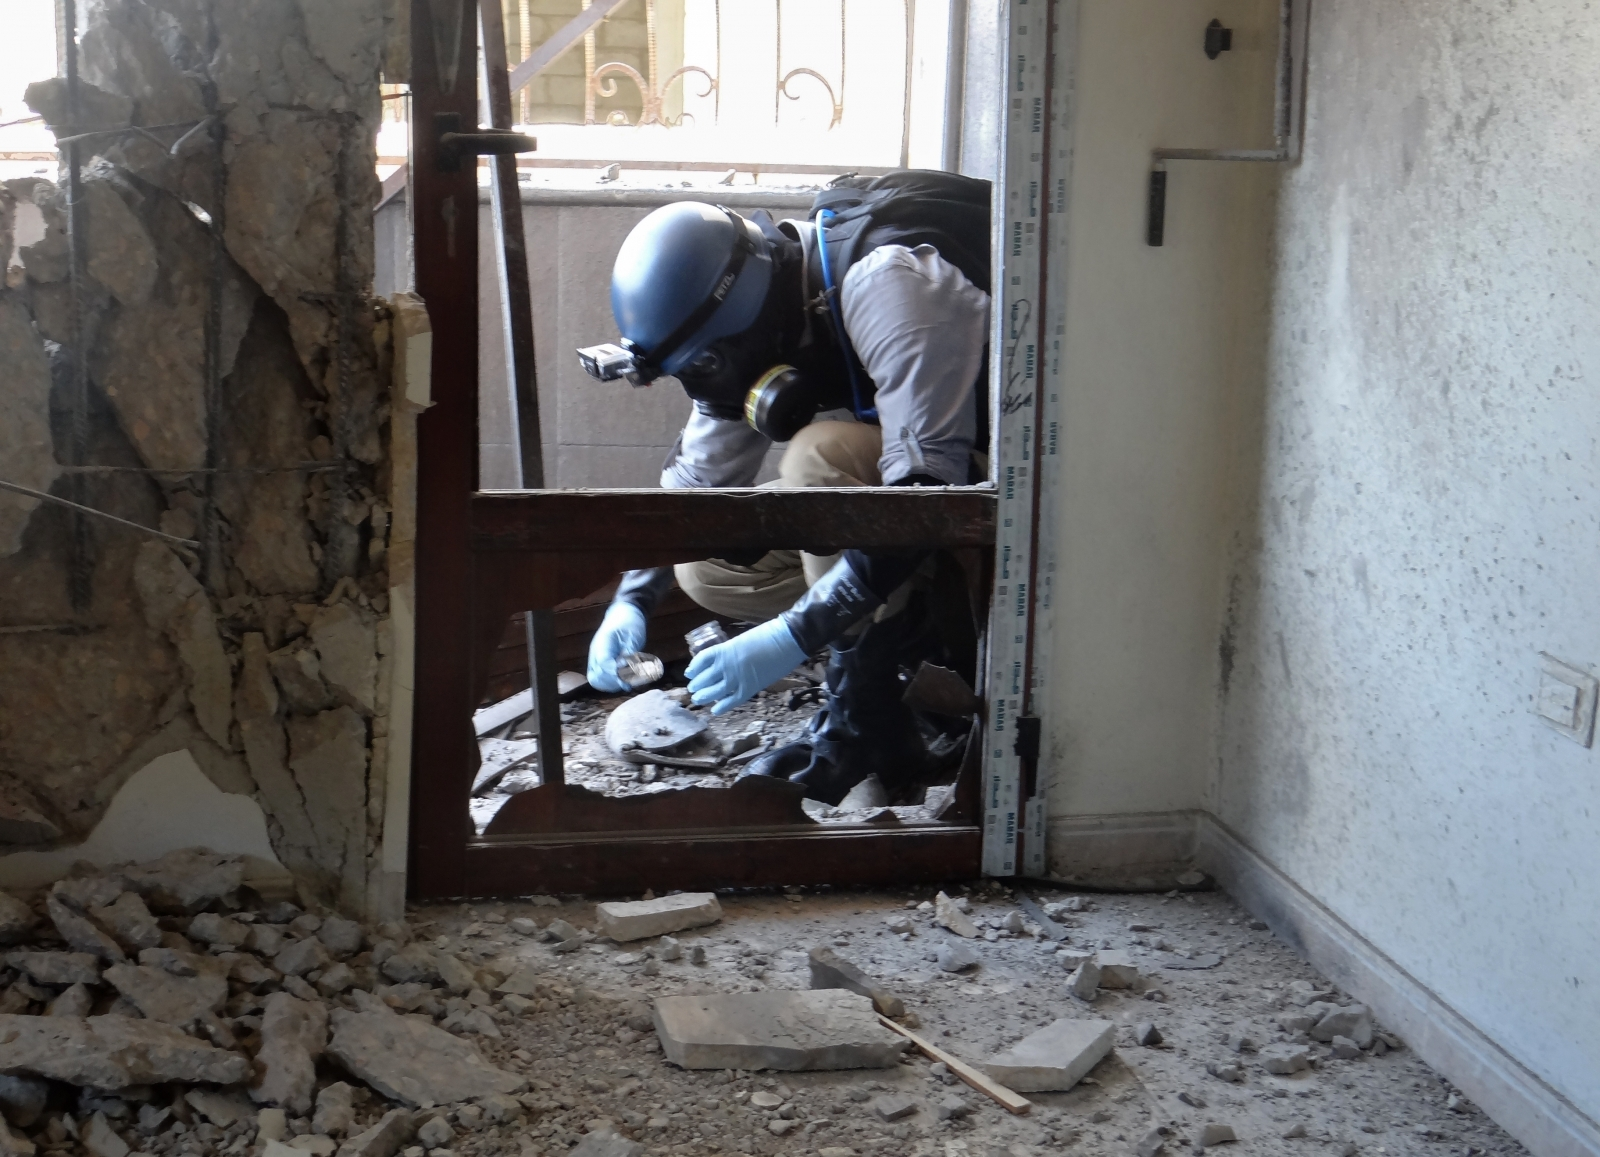 UN expert Ghouta sarin attack